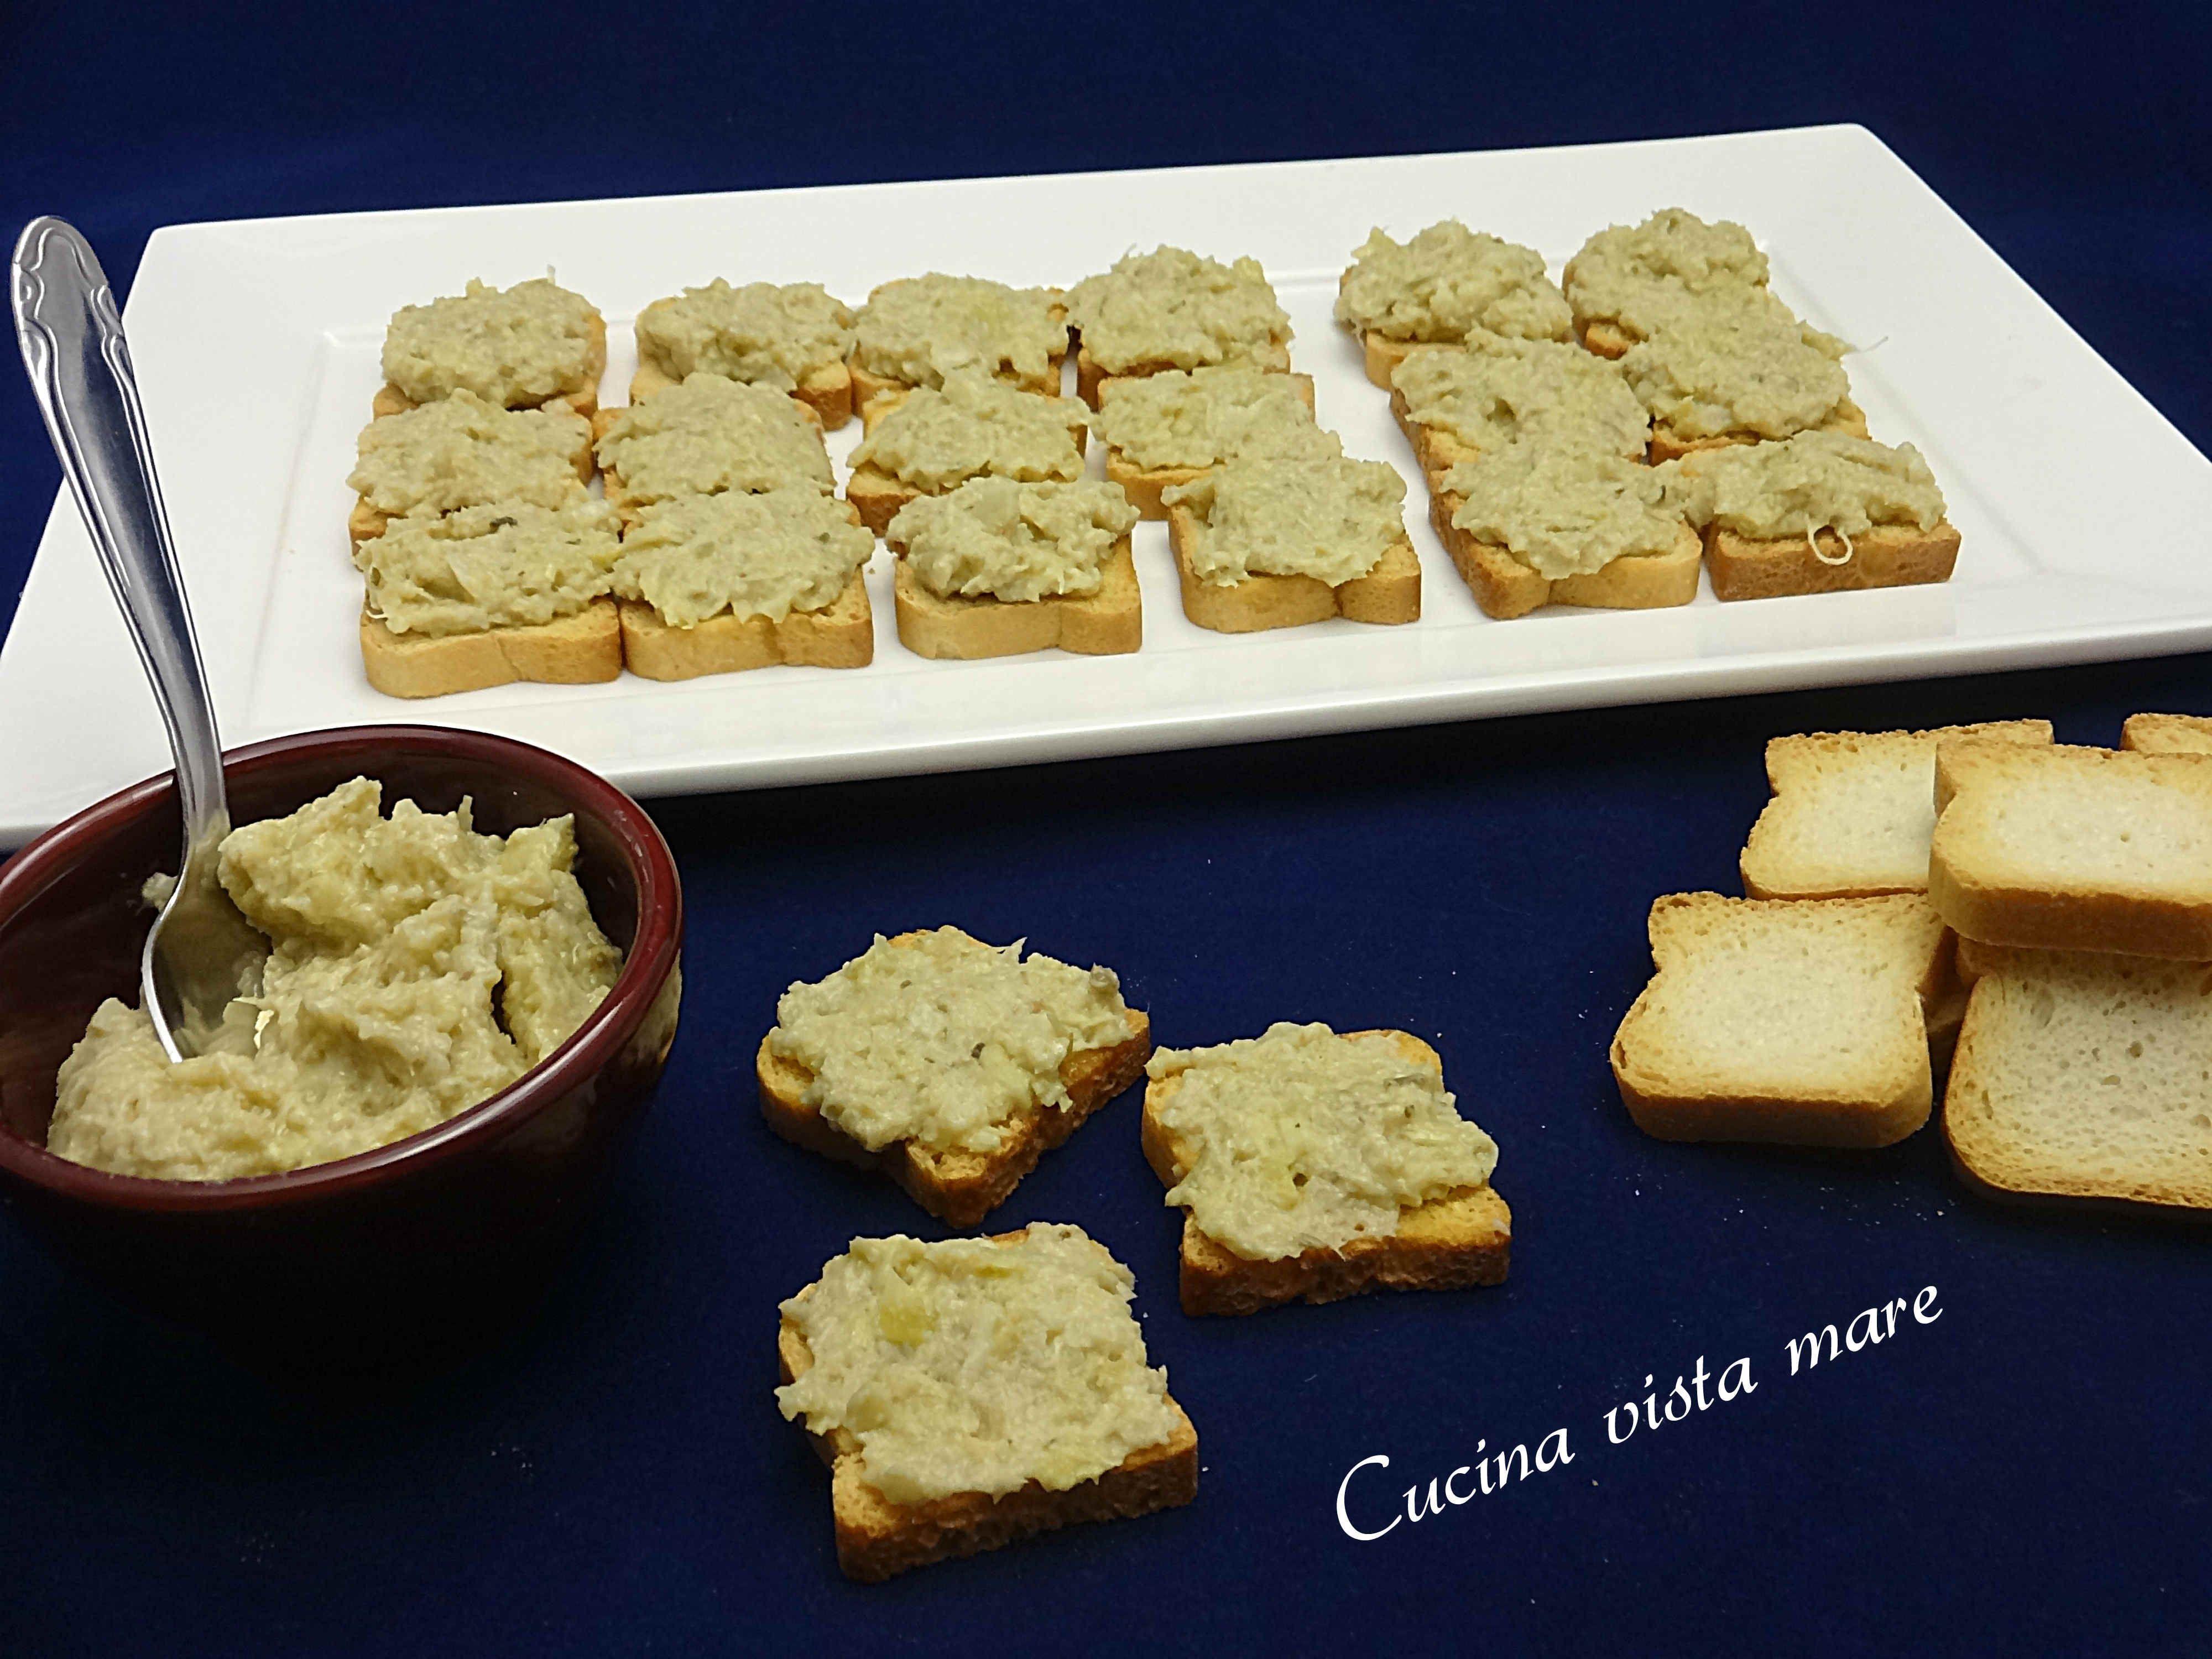 Crostini Alla Crema Di Carciofi Cucina Vista Mare Idee Alimentari Crostini Salsa Di Carciofi